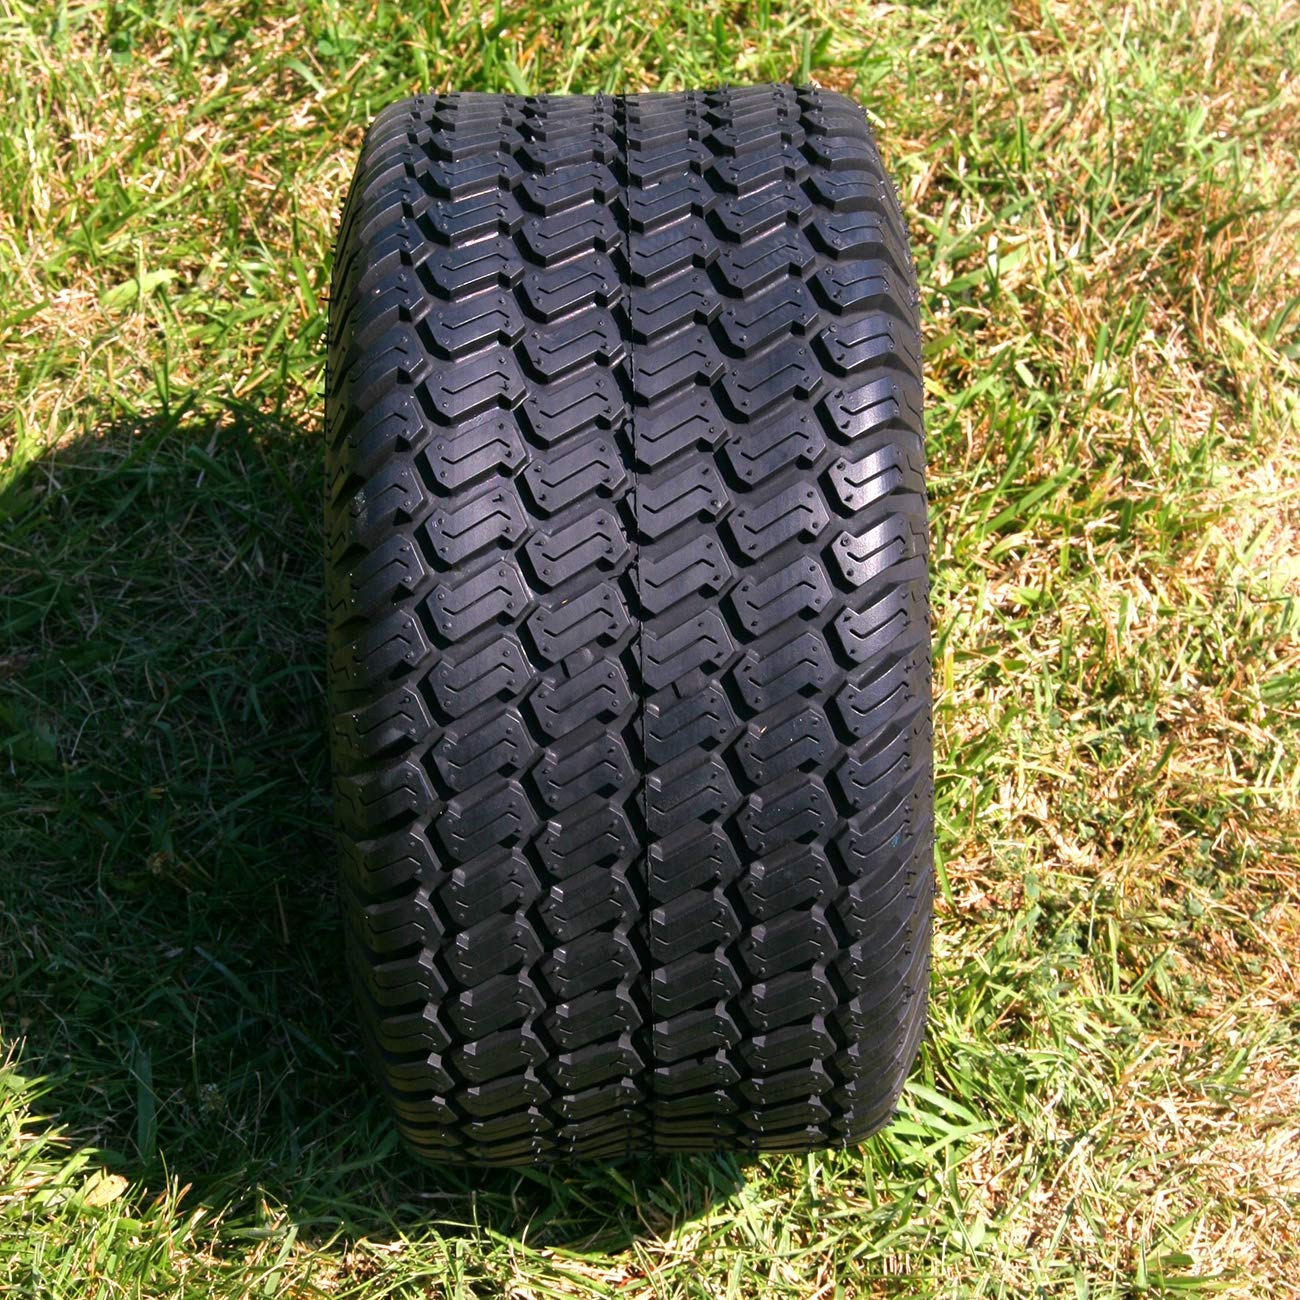 Hoosier Wheel 23x10.5-12 4Ply Turf Tire - Set of 2